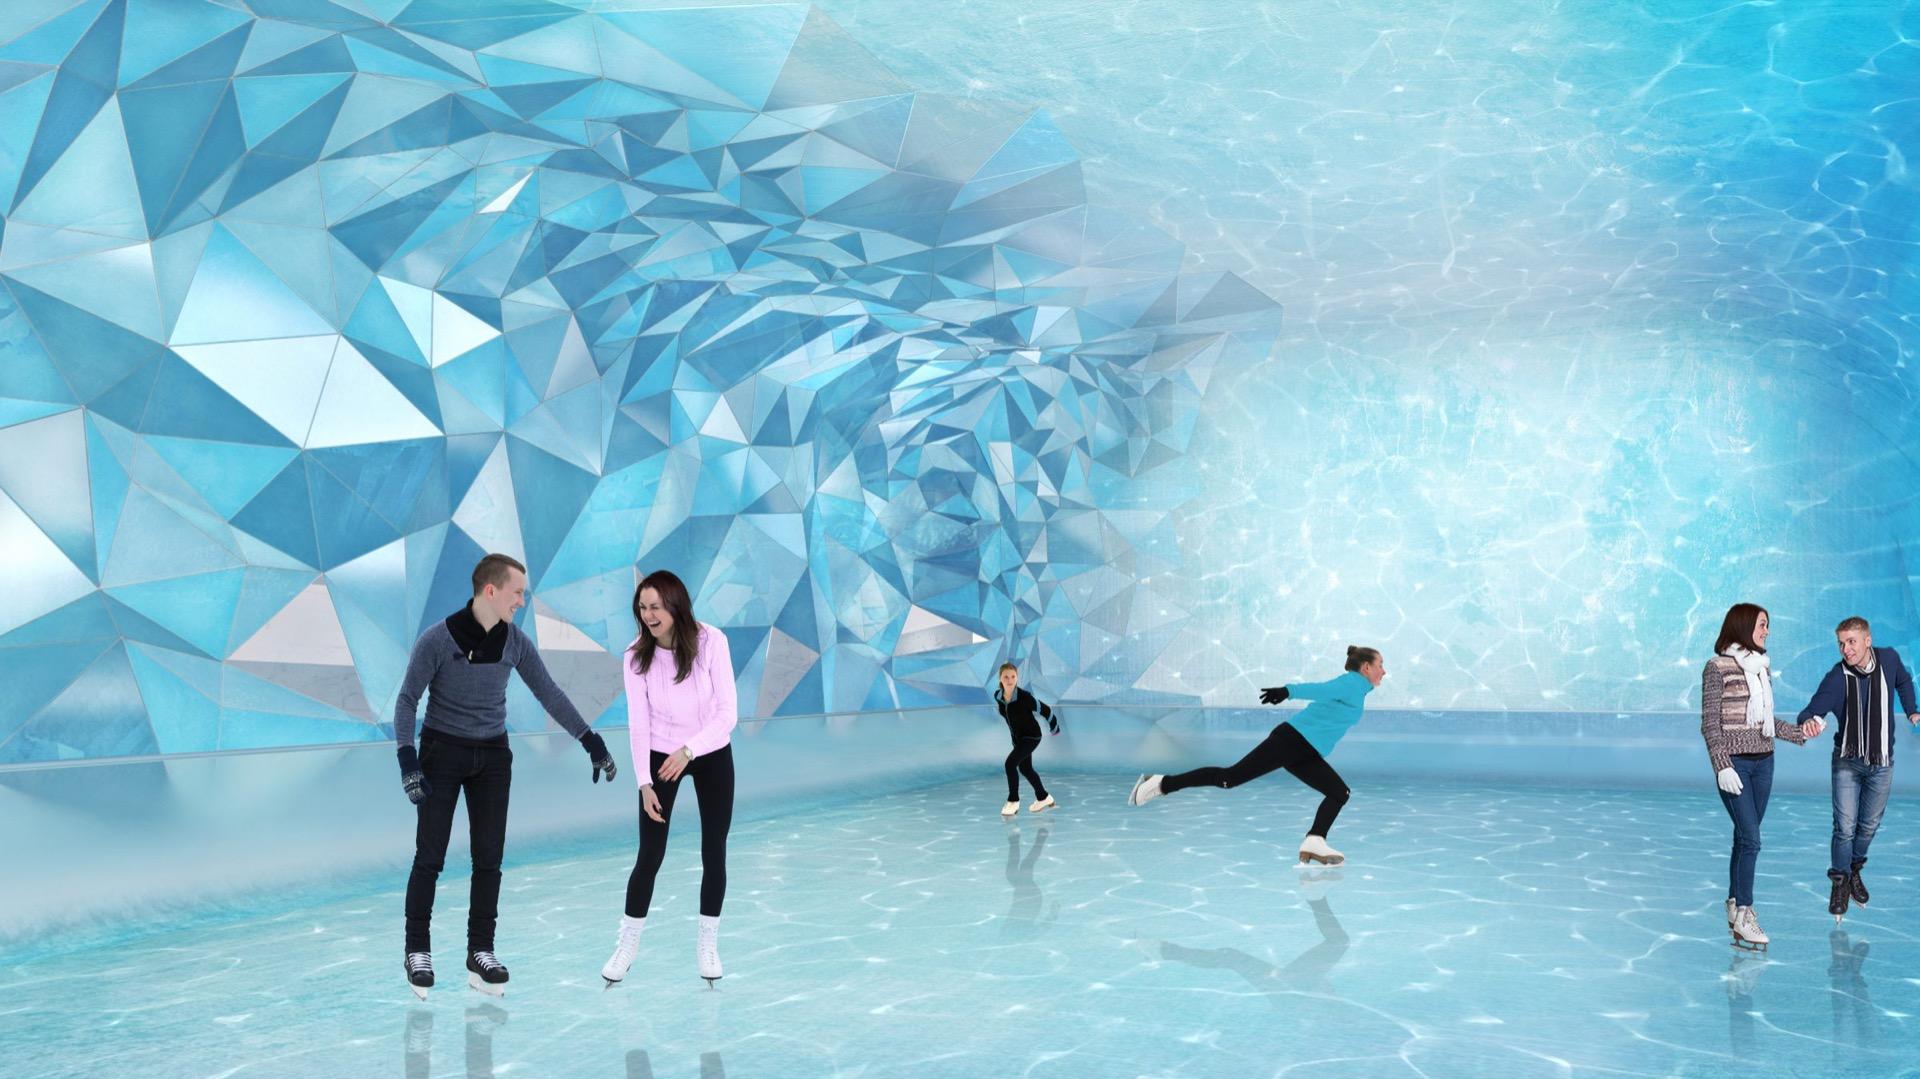 Ice-skating rink image 1